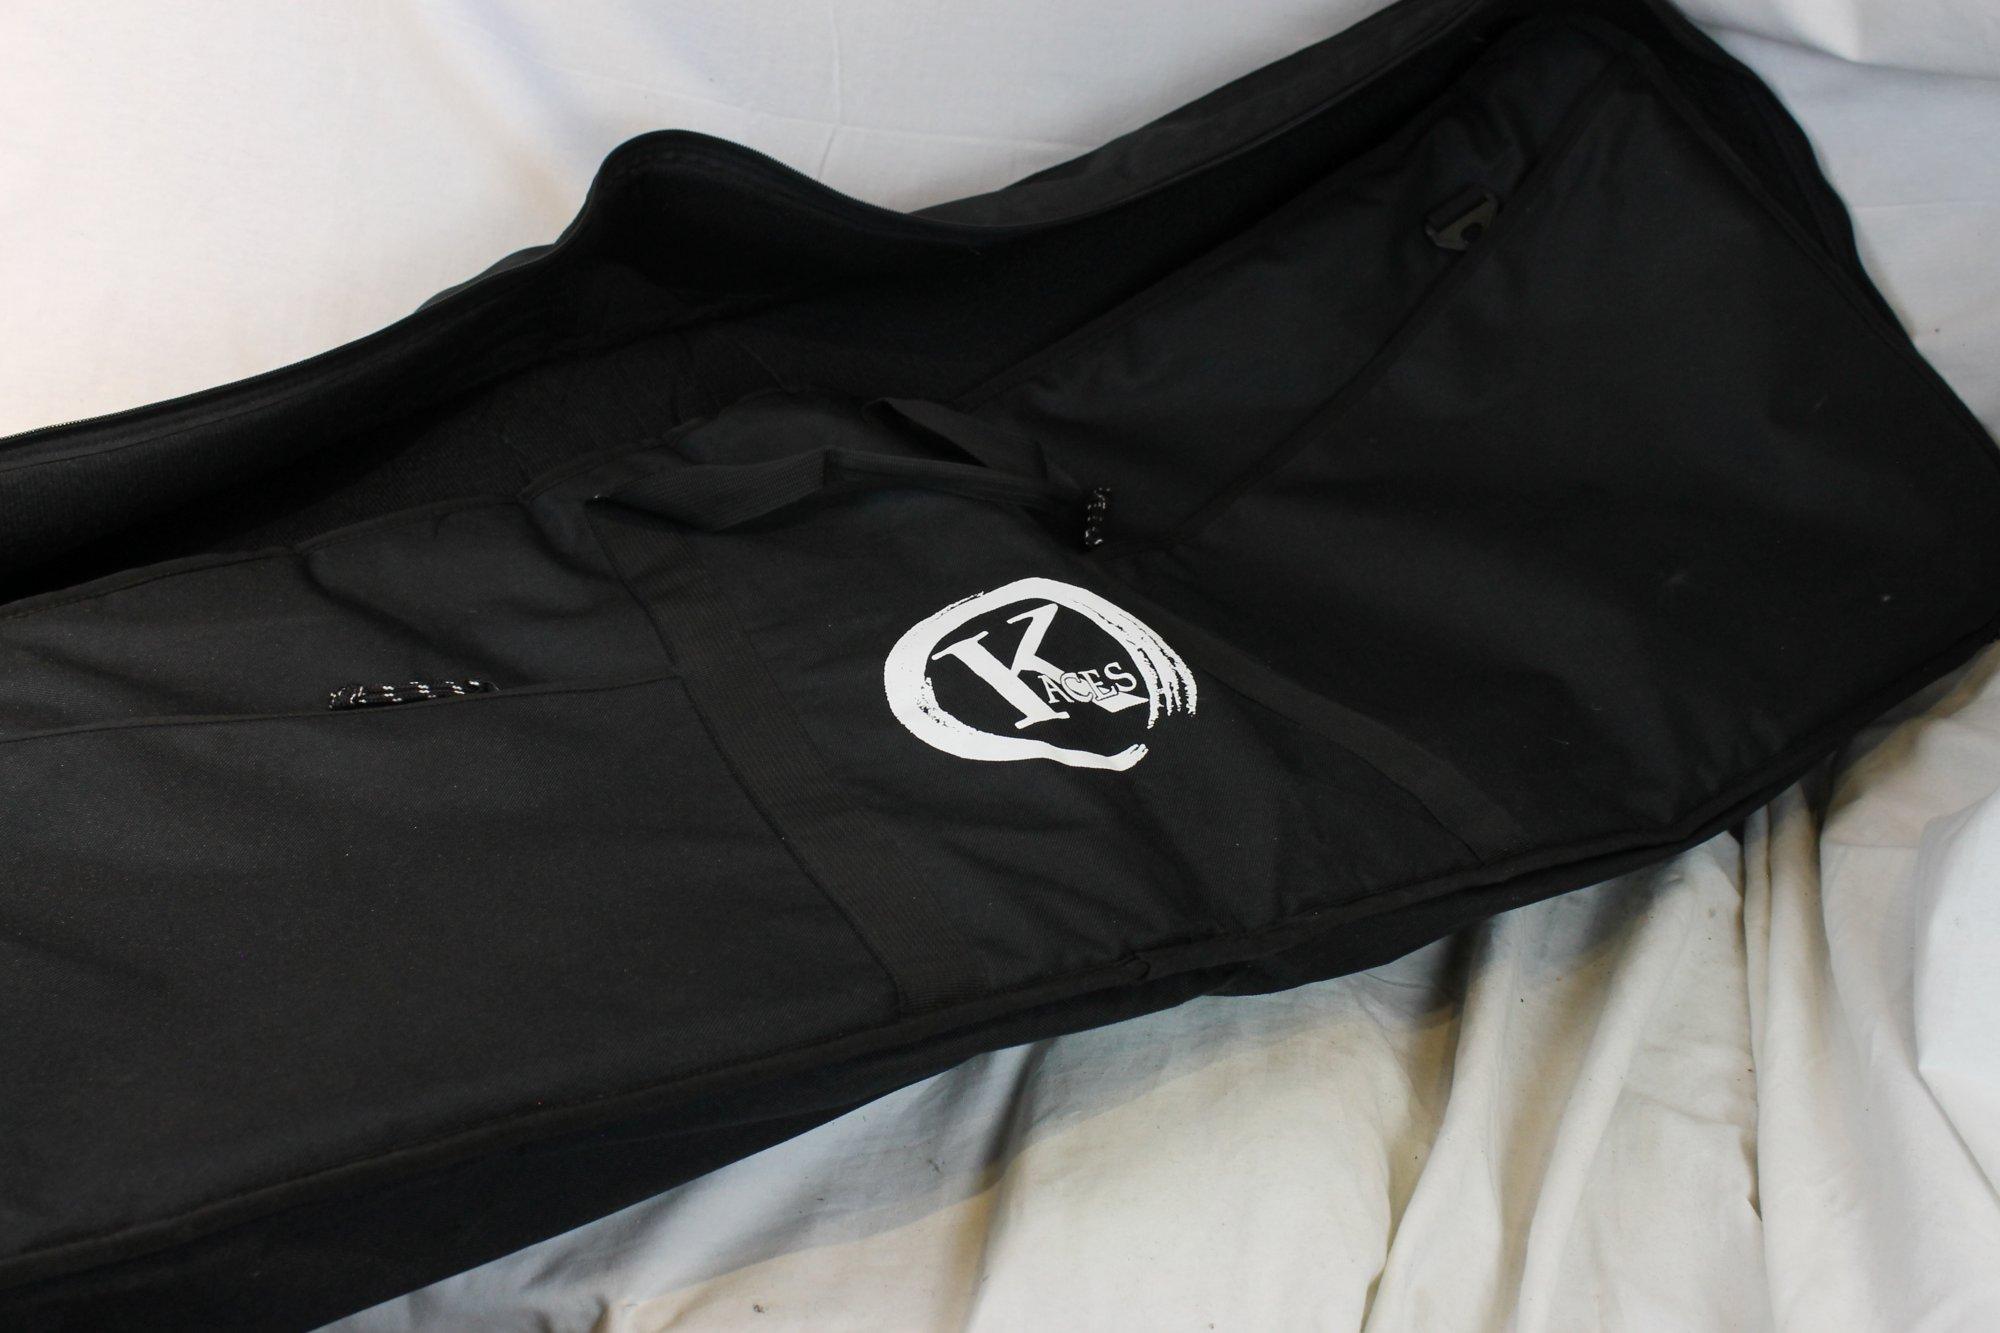 Black Kaces Gig Bag Soft Case for Keyboard 50 x 17.5 x 6  fits 88 Key Keyboard